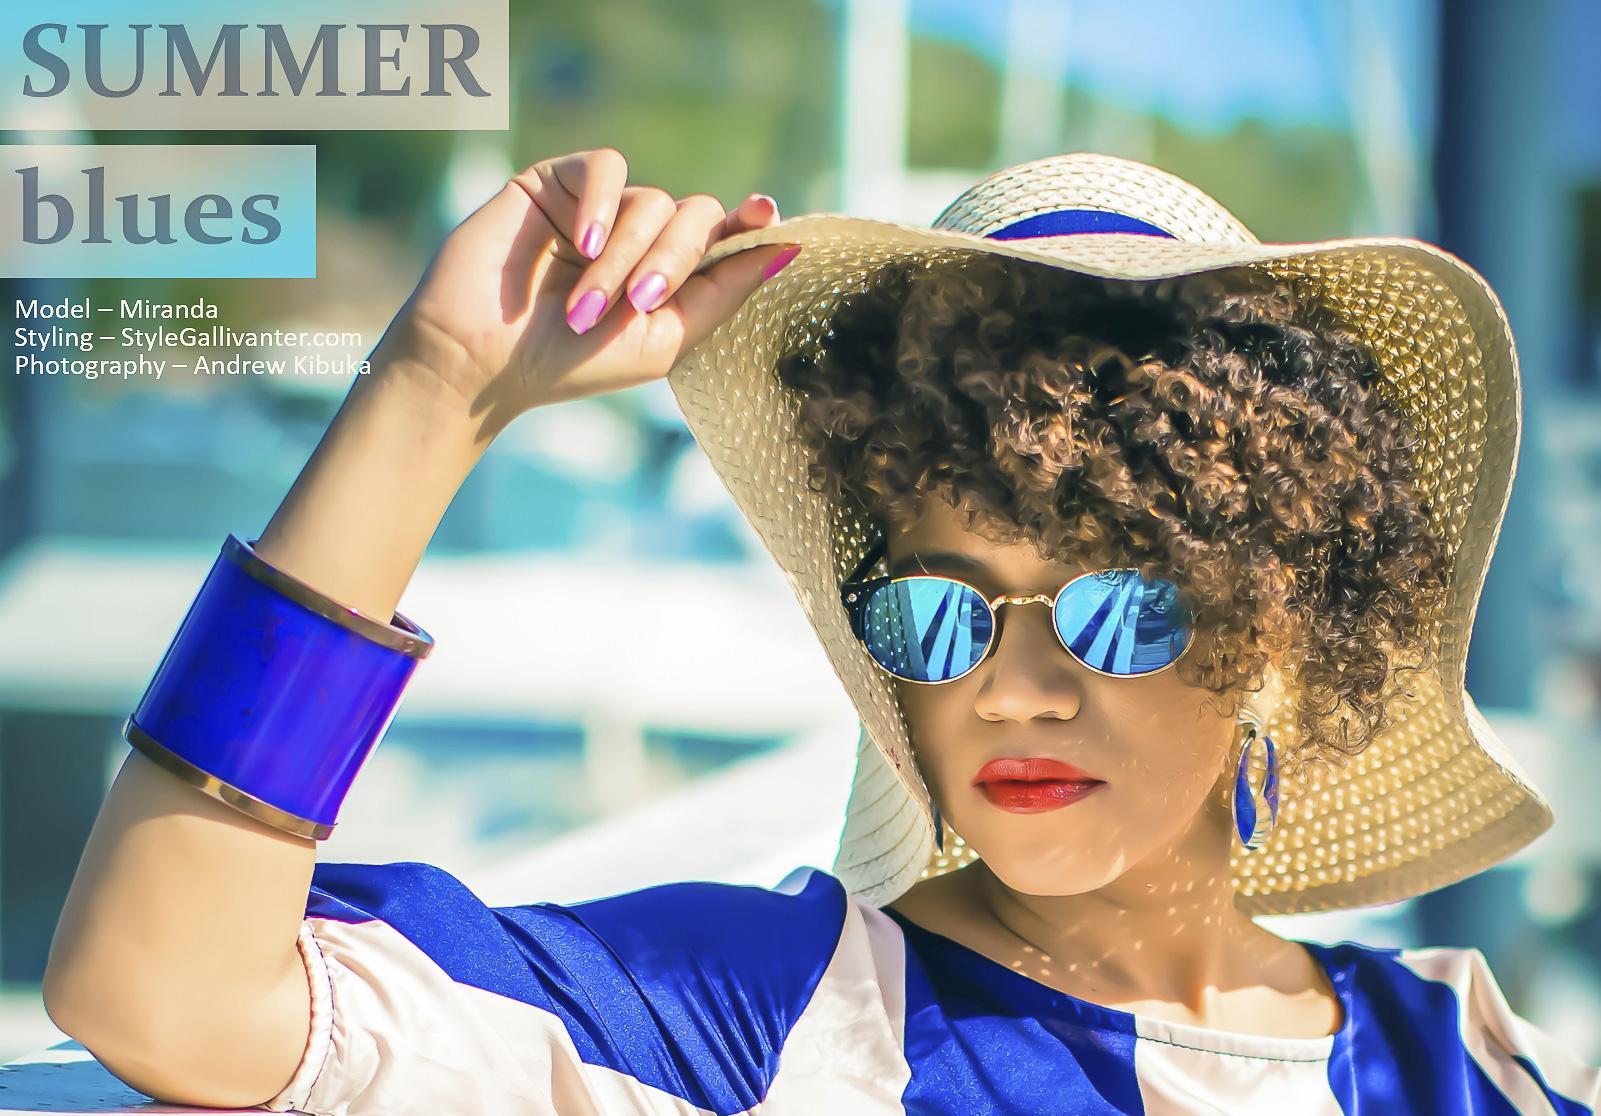 HAMILTON-ISLAND_TOP-AUSTRALIAN-DESTINATIONS_STYLEGALLIVANTER_MIRANDA-SAKHINO_sakhino_magazine-cover-december-2015_summer-2015-editorials_australia's-top-fashion-bloggers-19